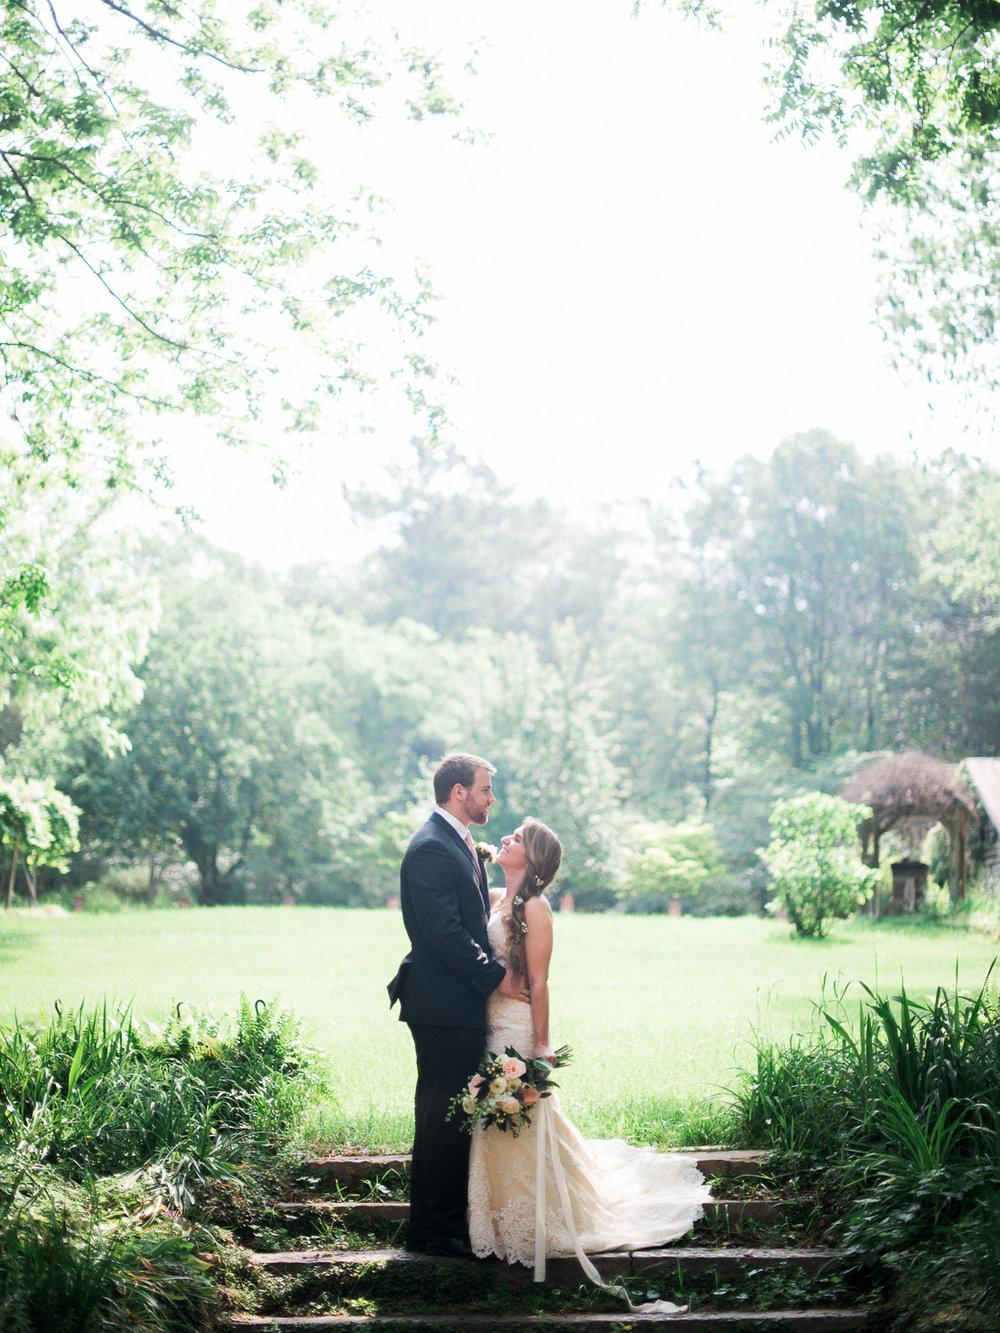 christinadavisphotography-romanticwedding-gardenweddinginspiration59.jpg